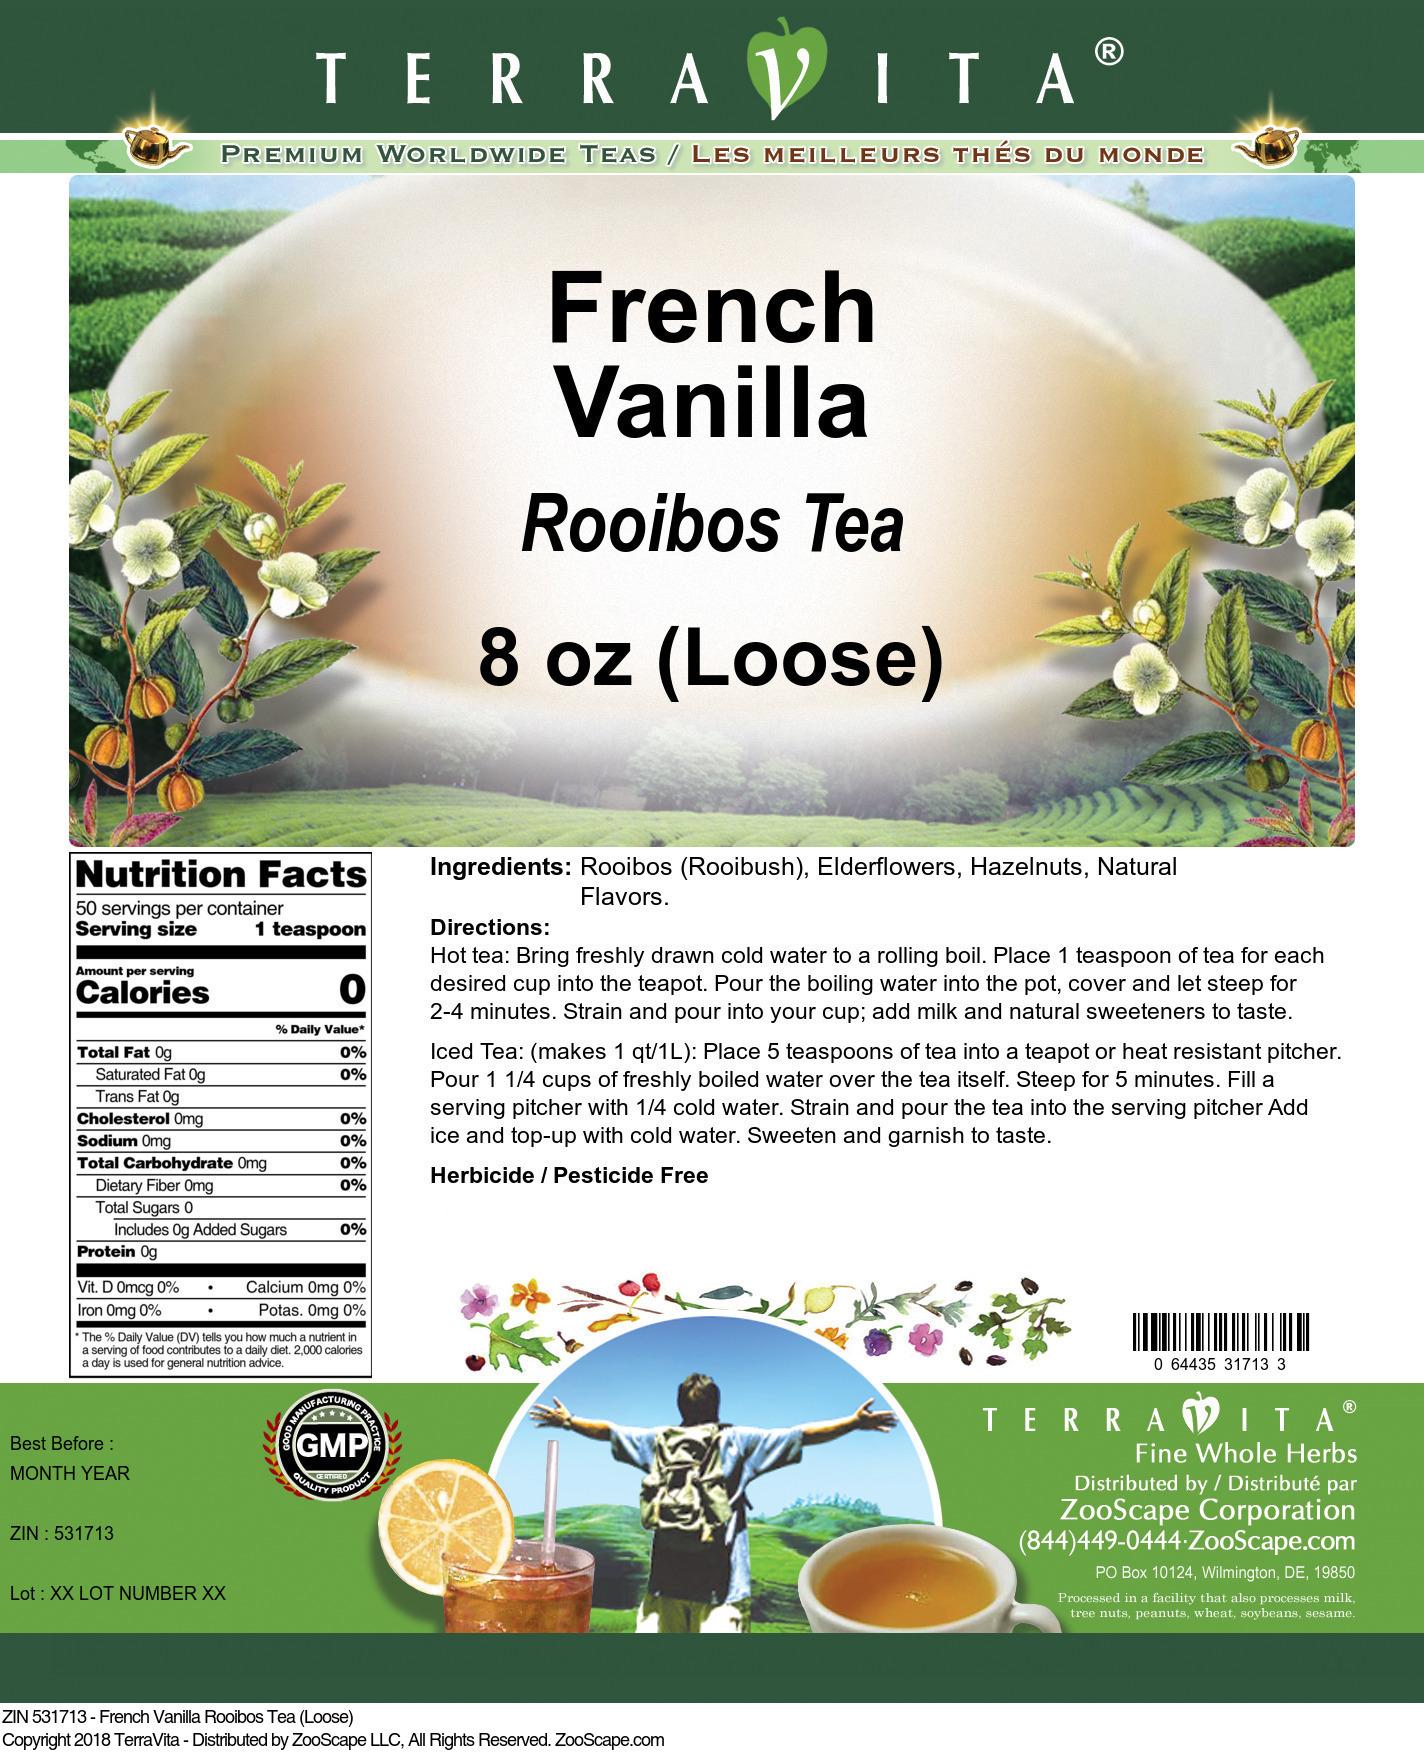 French Vanilla Rooibos Tea